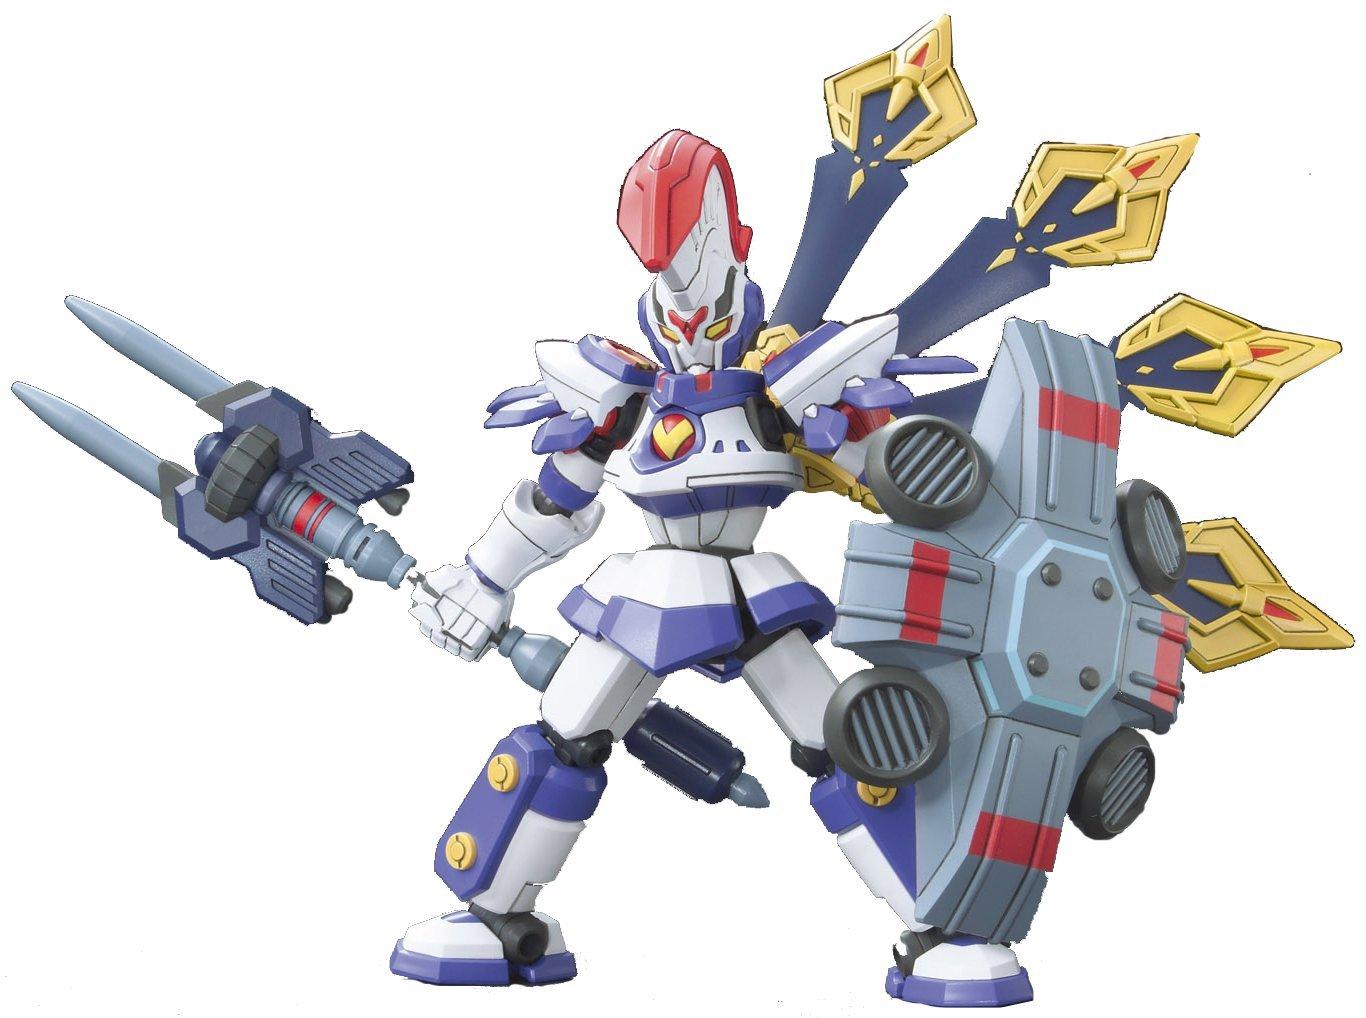 Buy The Little Battlers Hyper Function Lbx Achilles Ax 00 Perfect